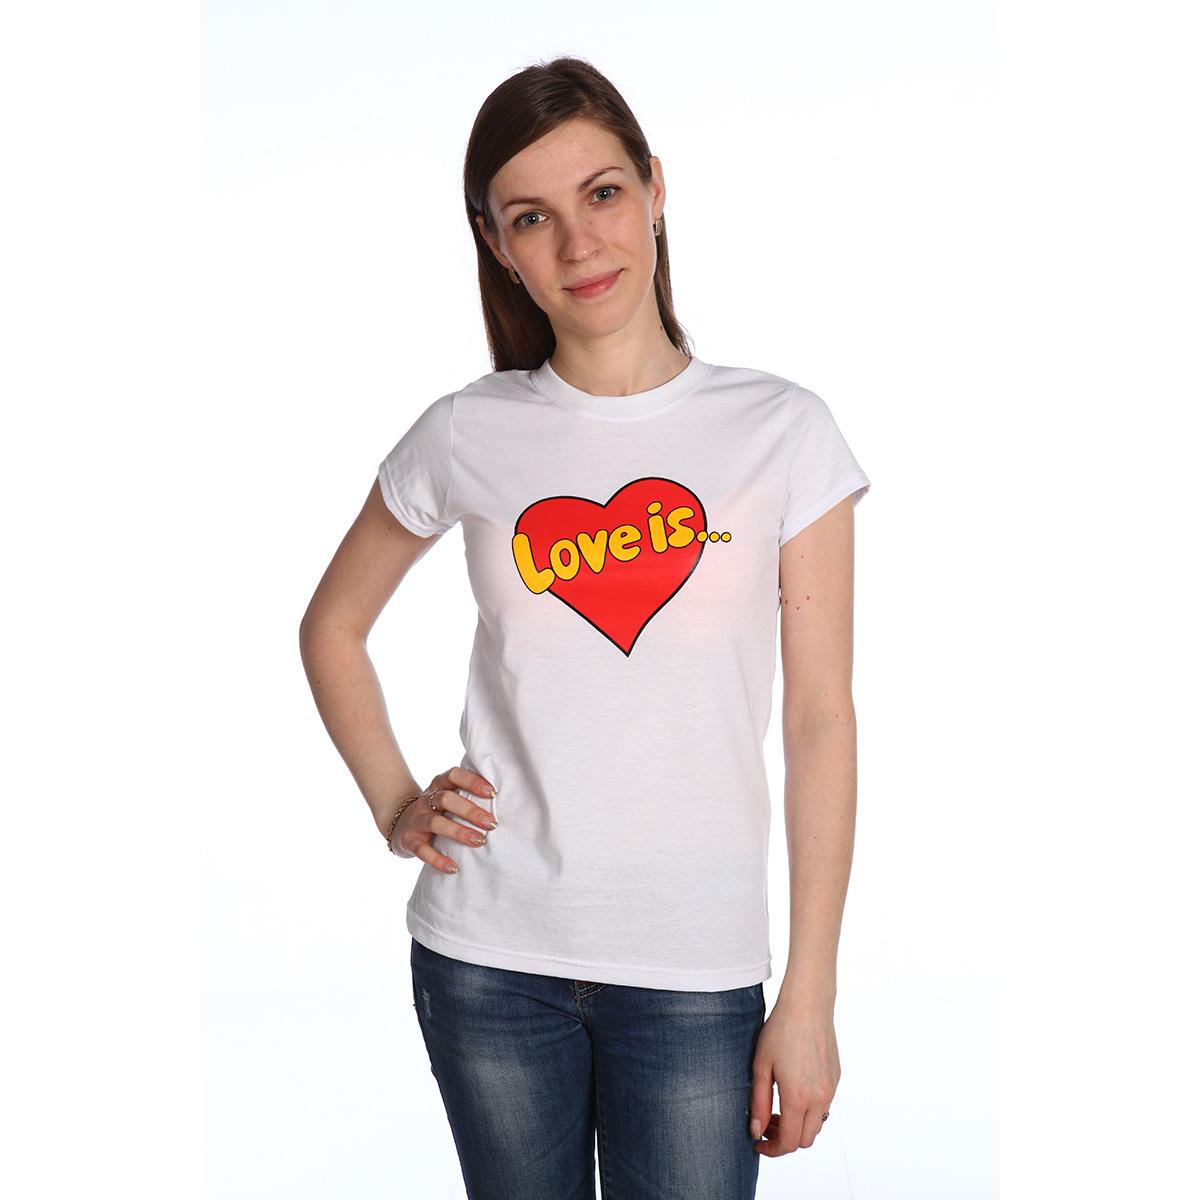 Женская футболка Love is Белый, размер XLБлузки, майки, кофты<br>Обхват груди:100 см<br>Обхват талии:82 см<br>Обхват бедер:108 см<br>Рост:164-170 см<br><br>Тип: Жен. футболка<br>Размер: XL<br>Материал: Кулирка